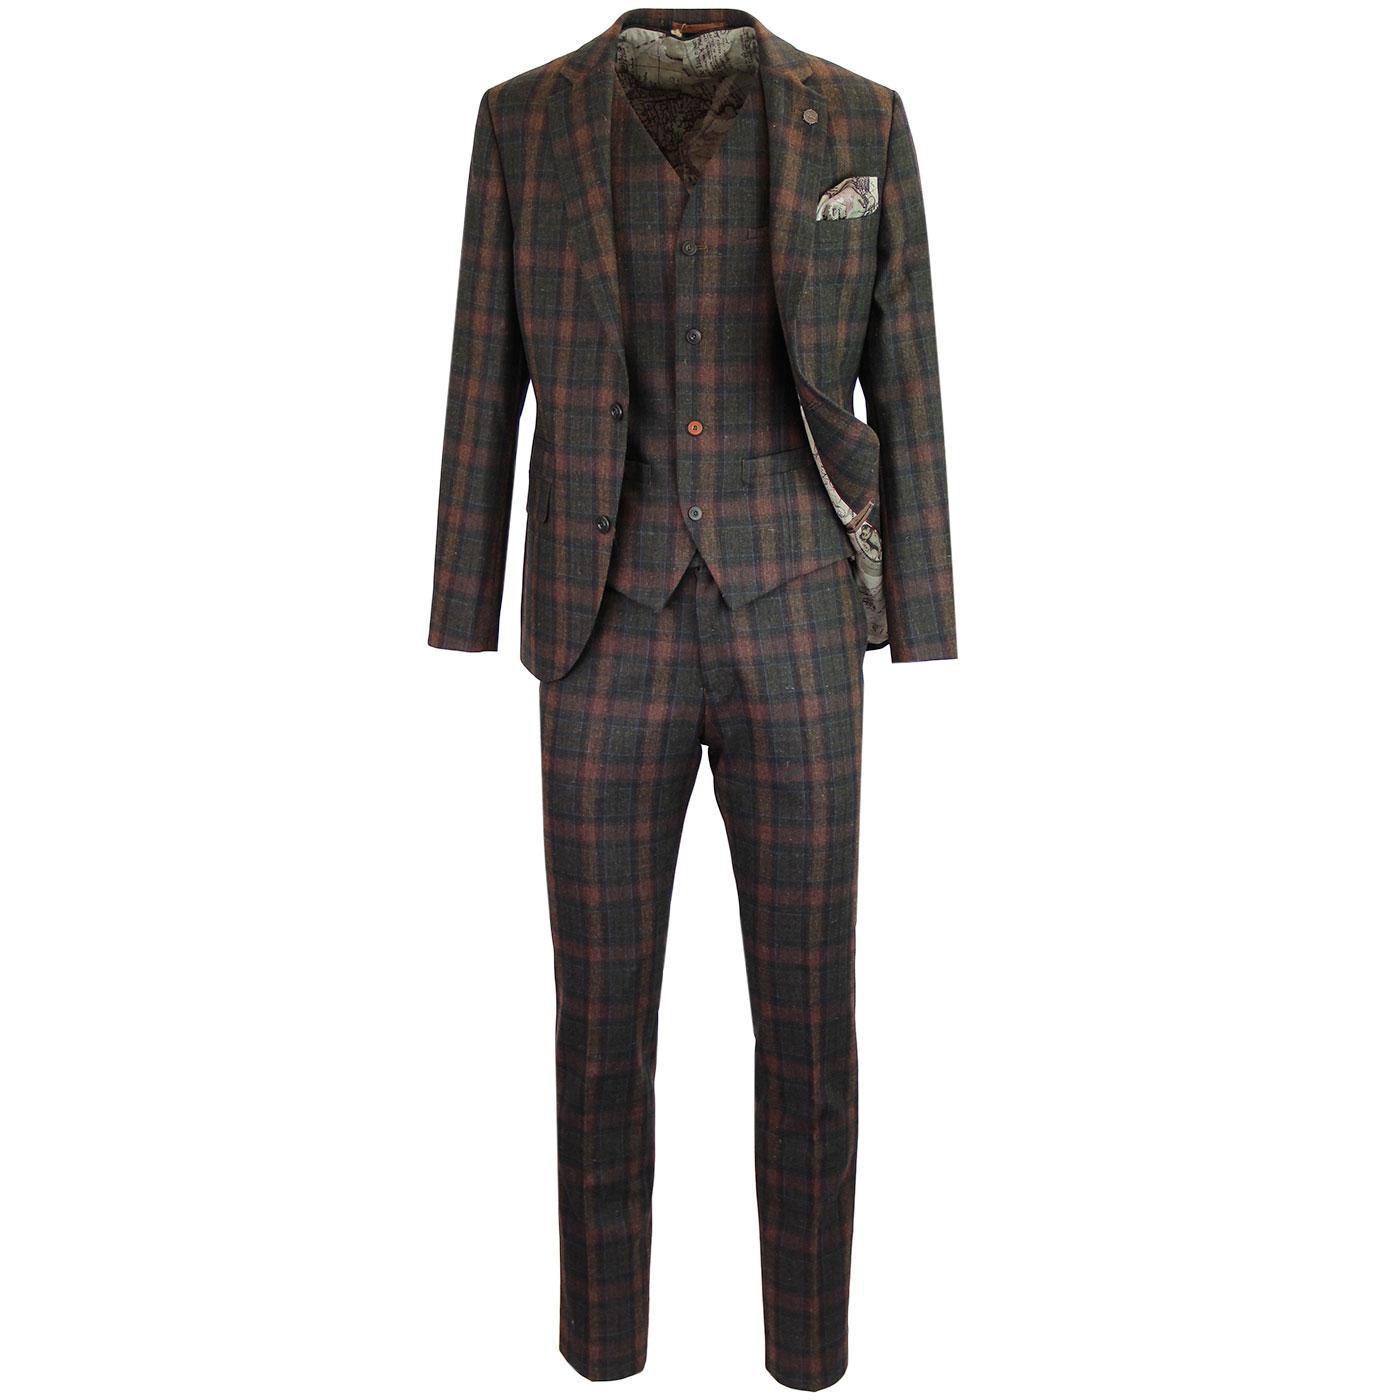 GIBSON LONDON Mod Tartan Check 2 or 3 Piece Suit